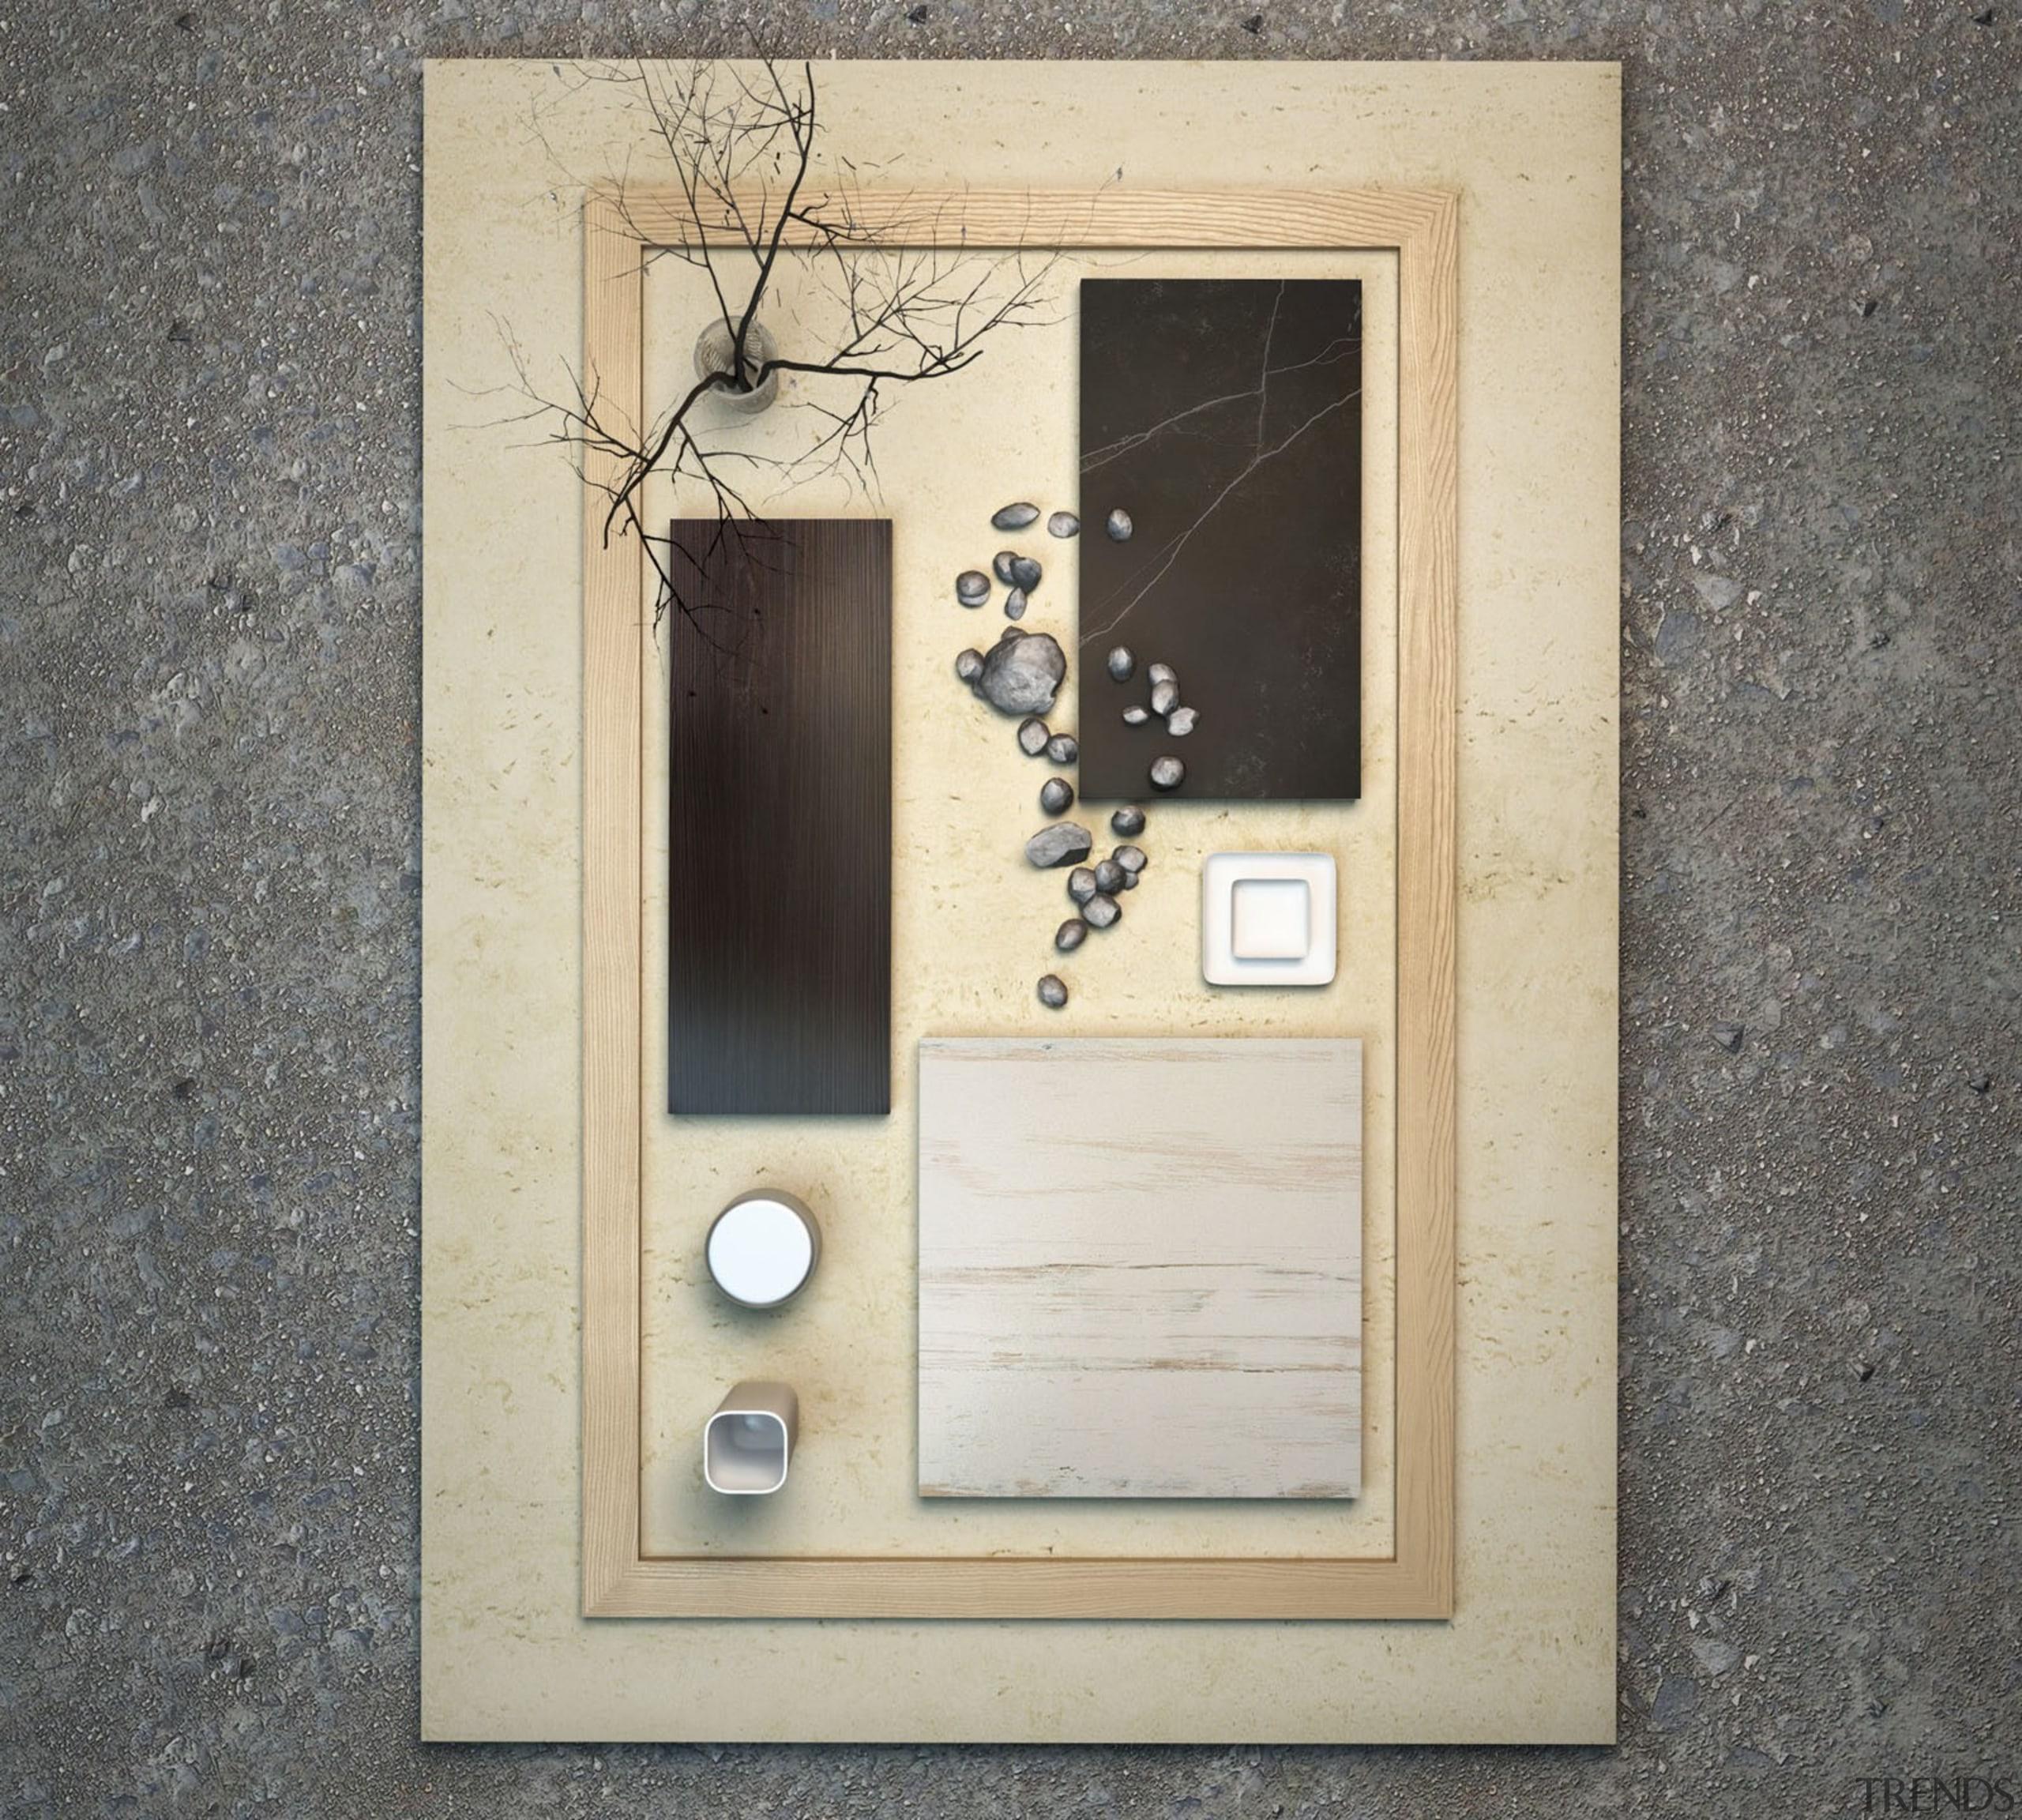 Spring Collection - Wild and Natura - Spring door, window, orange, gray